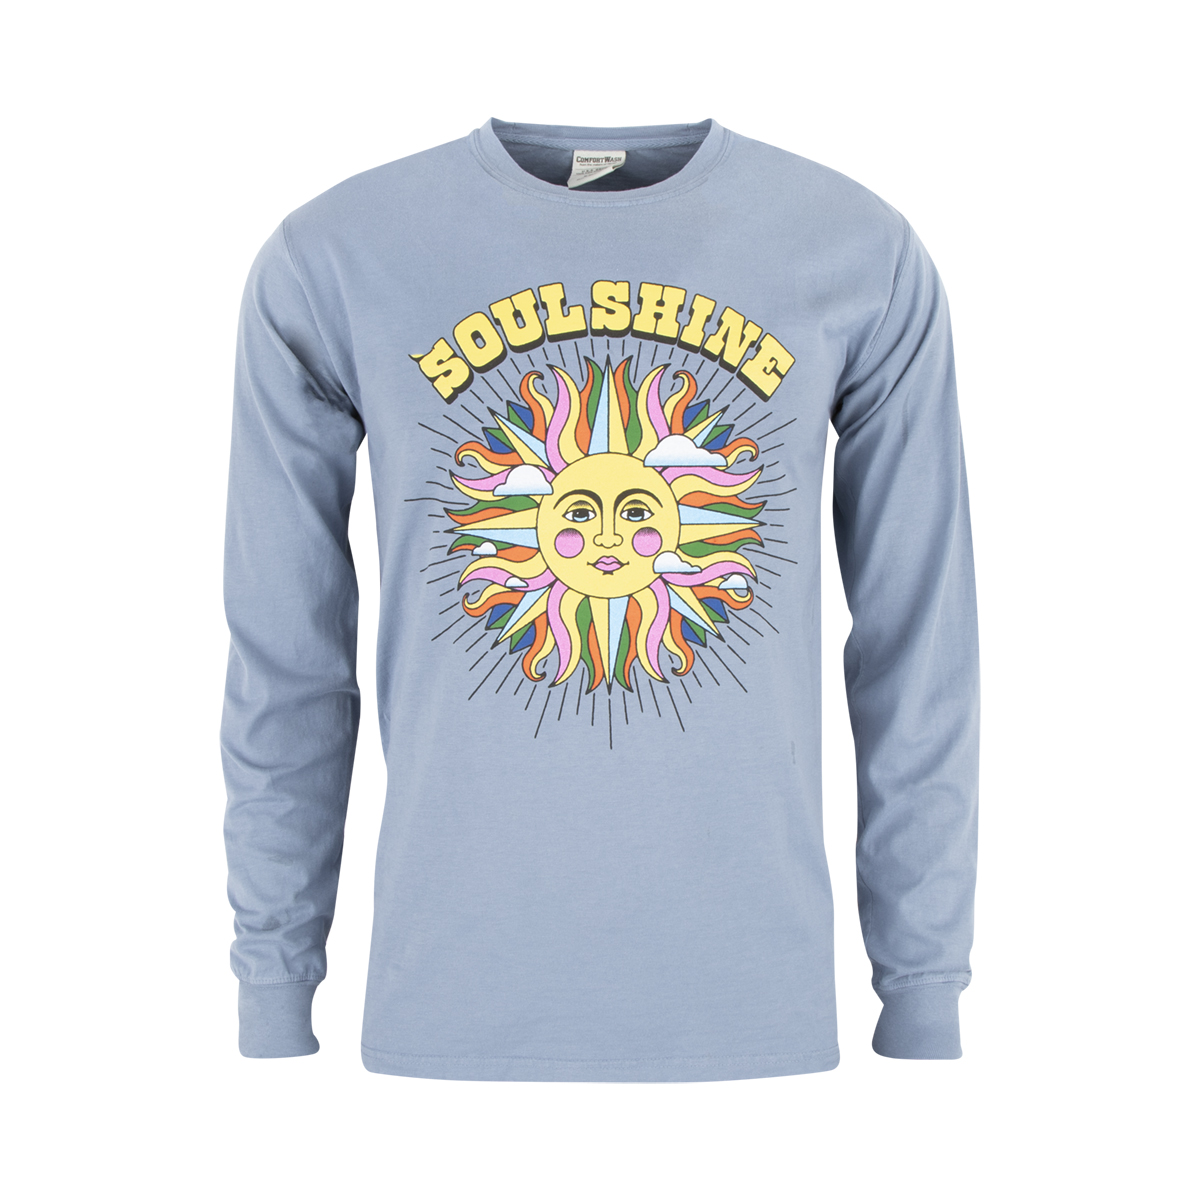 Soulshine Long-Sleeve T-Shirt